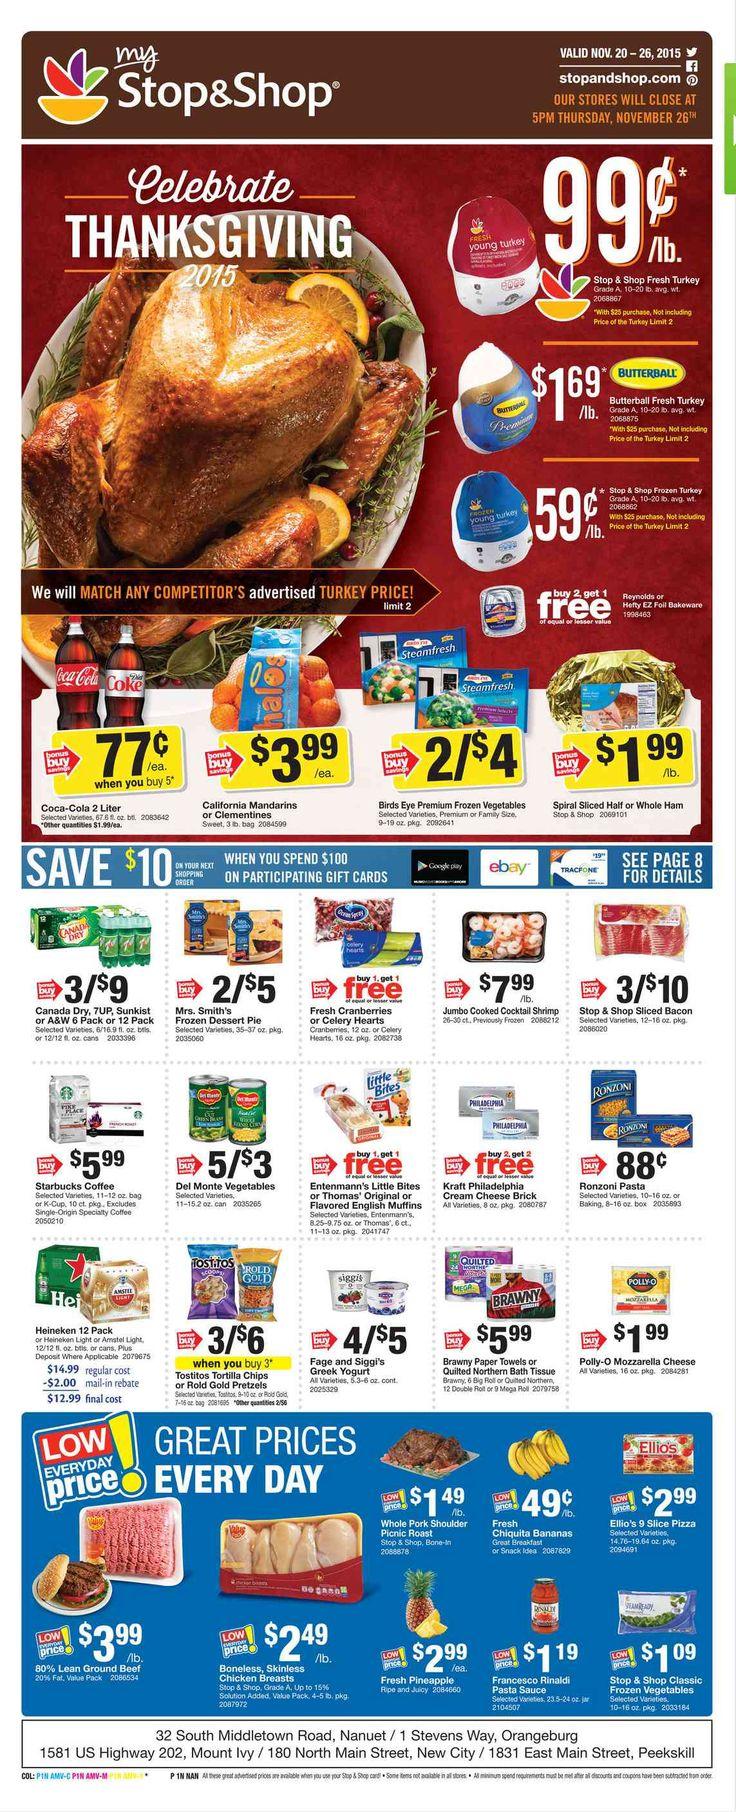 Stop and Shop Circular November 20 - 26, 2015 - http://www.olcatalog.com/grocery/stop-and-shop-circular.html